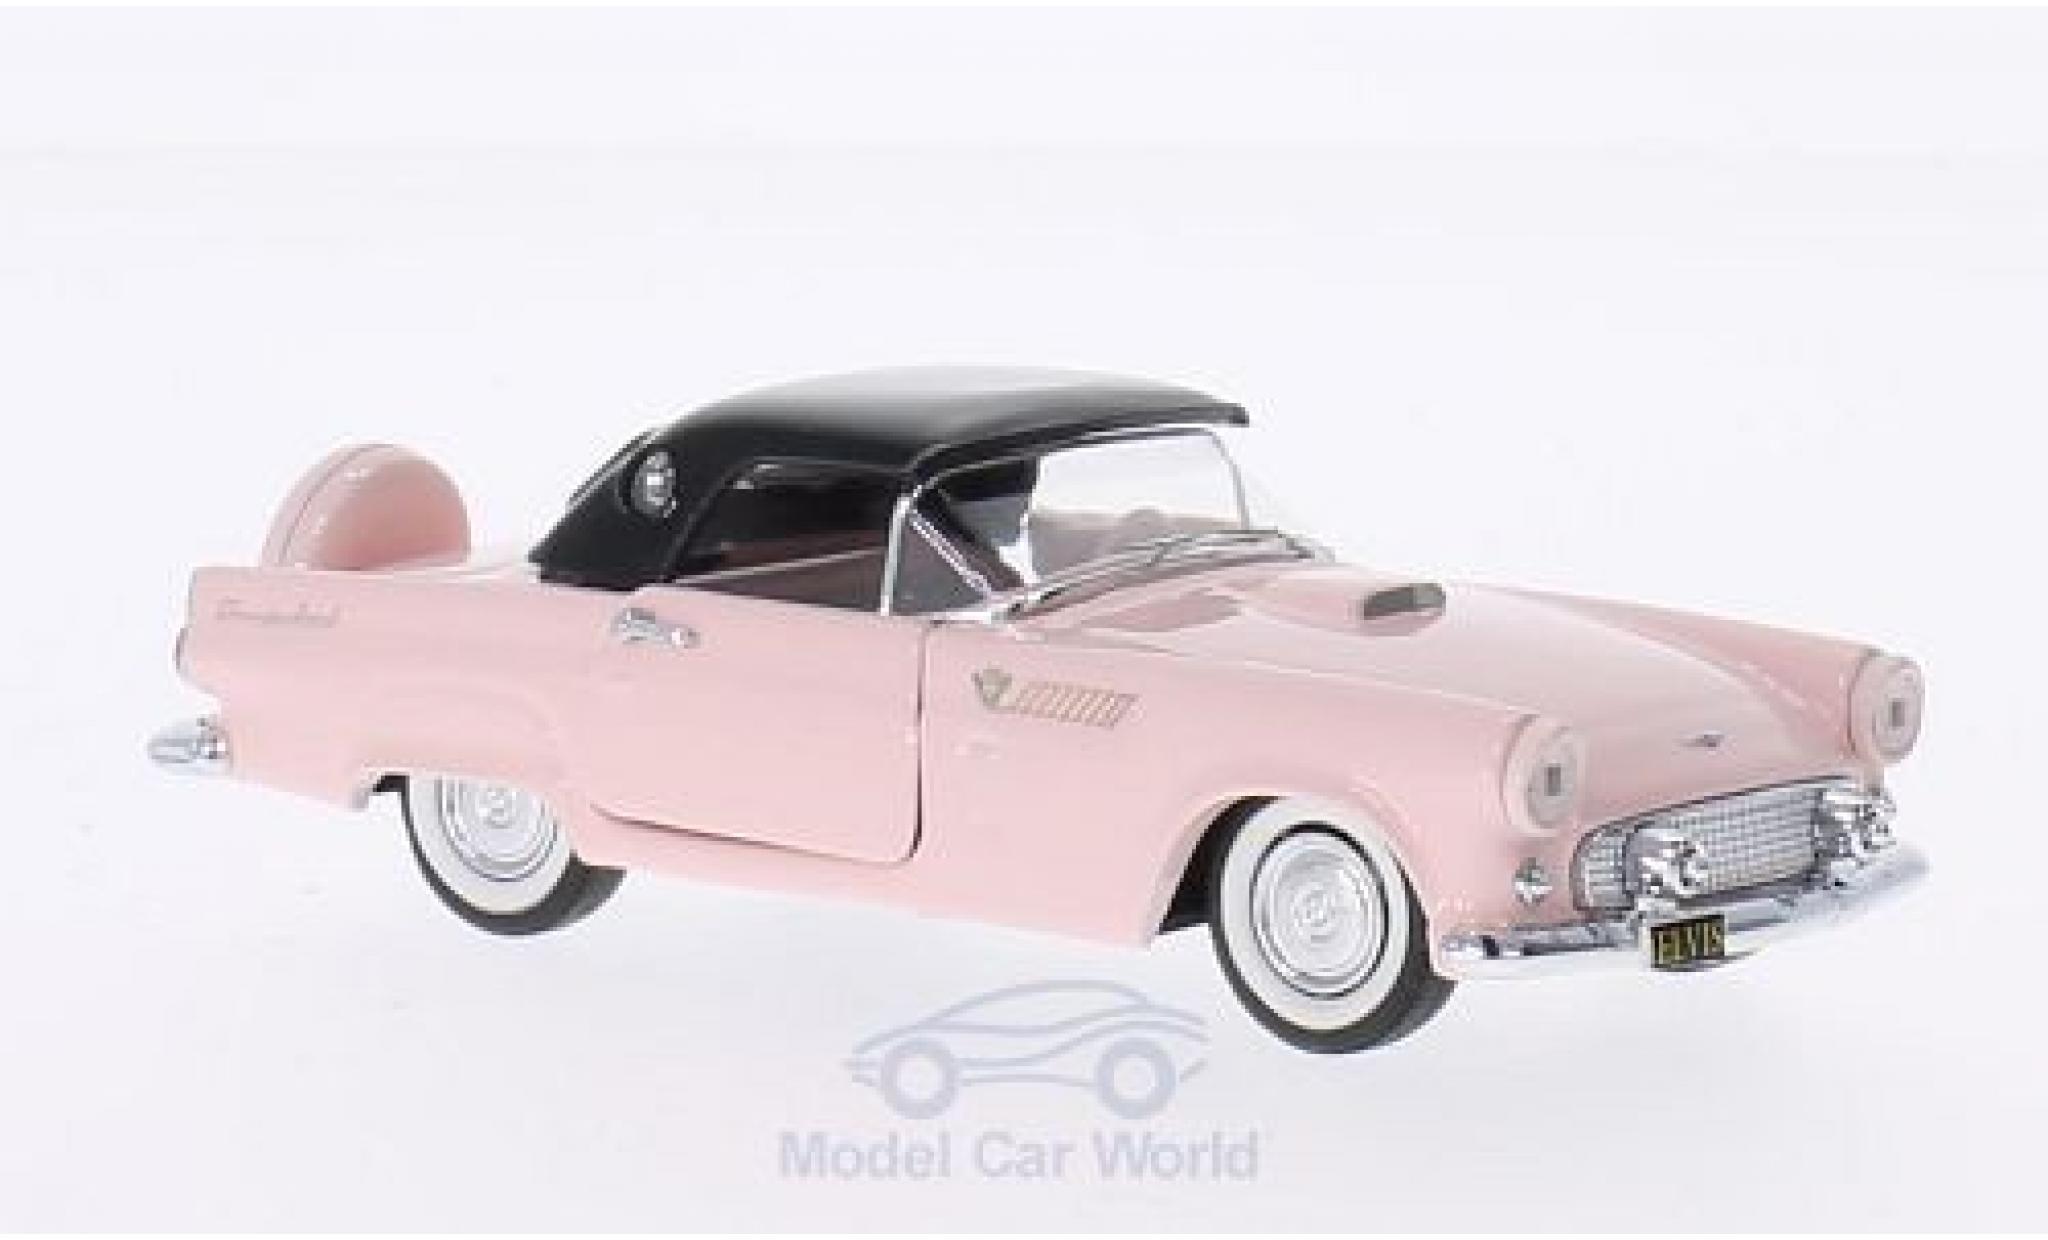 Ford Thunderbird 1956 1/43 Rio rosa/negro Elvis Presley Personal Car